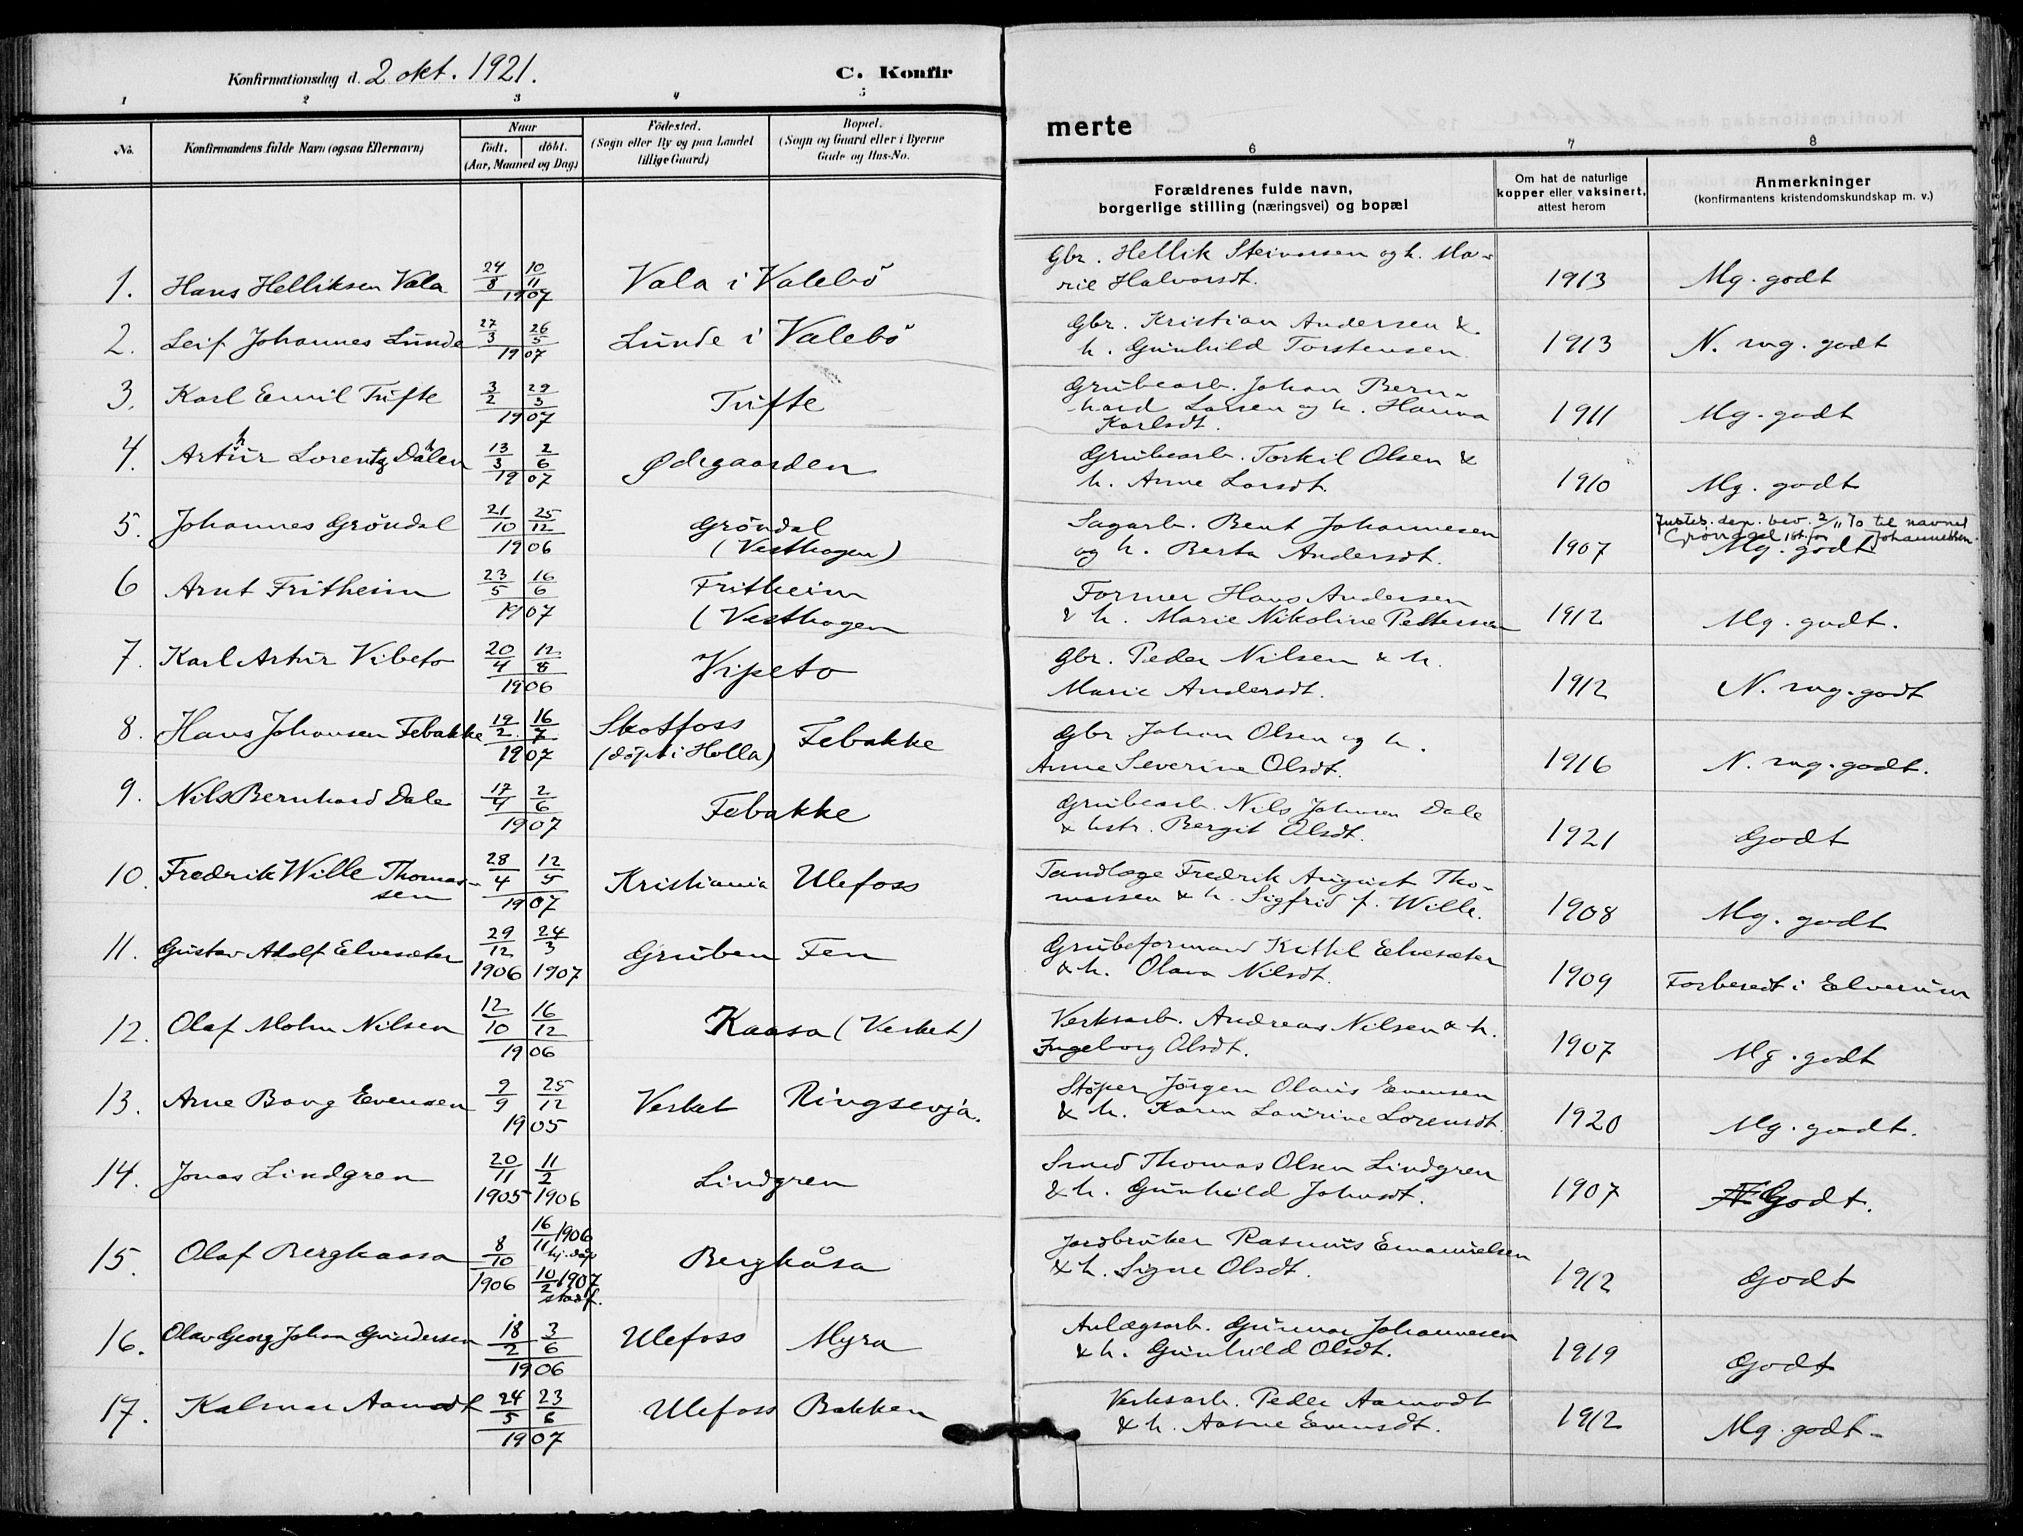 SAKO, Holla kirkebøker, F/Fa/L0012: Ministerialbok nr. 12, 1907-1923, s. 159